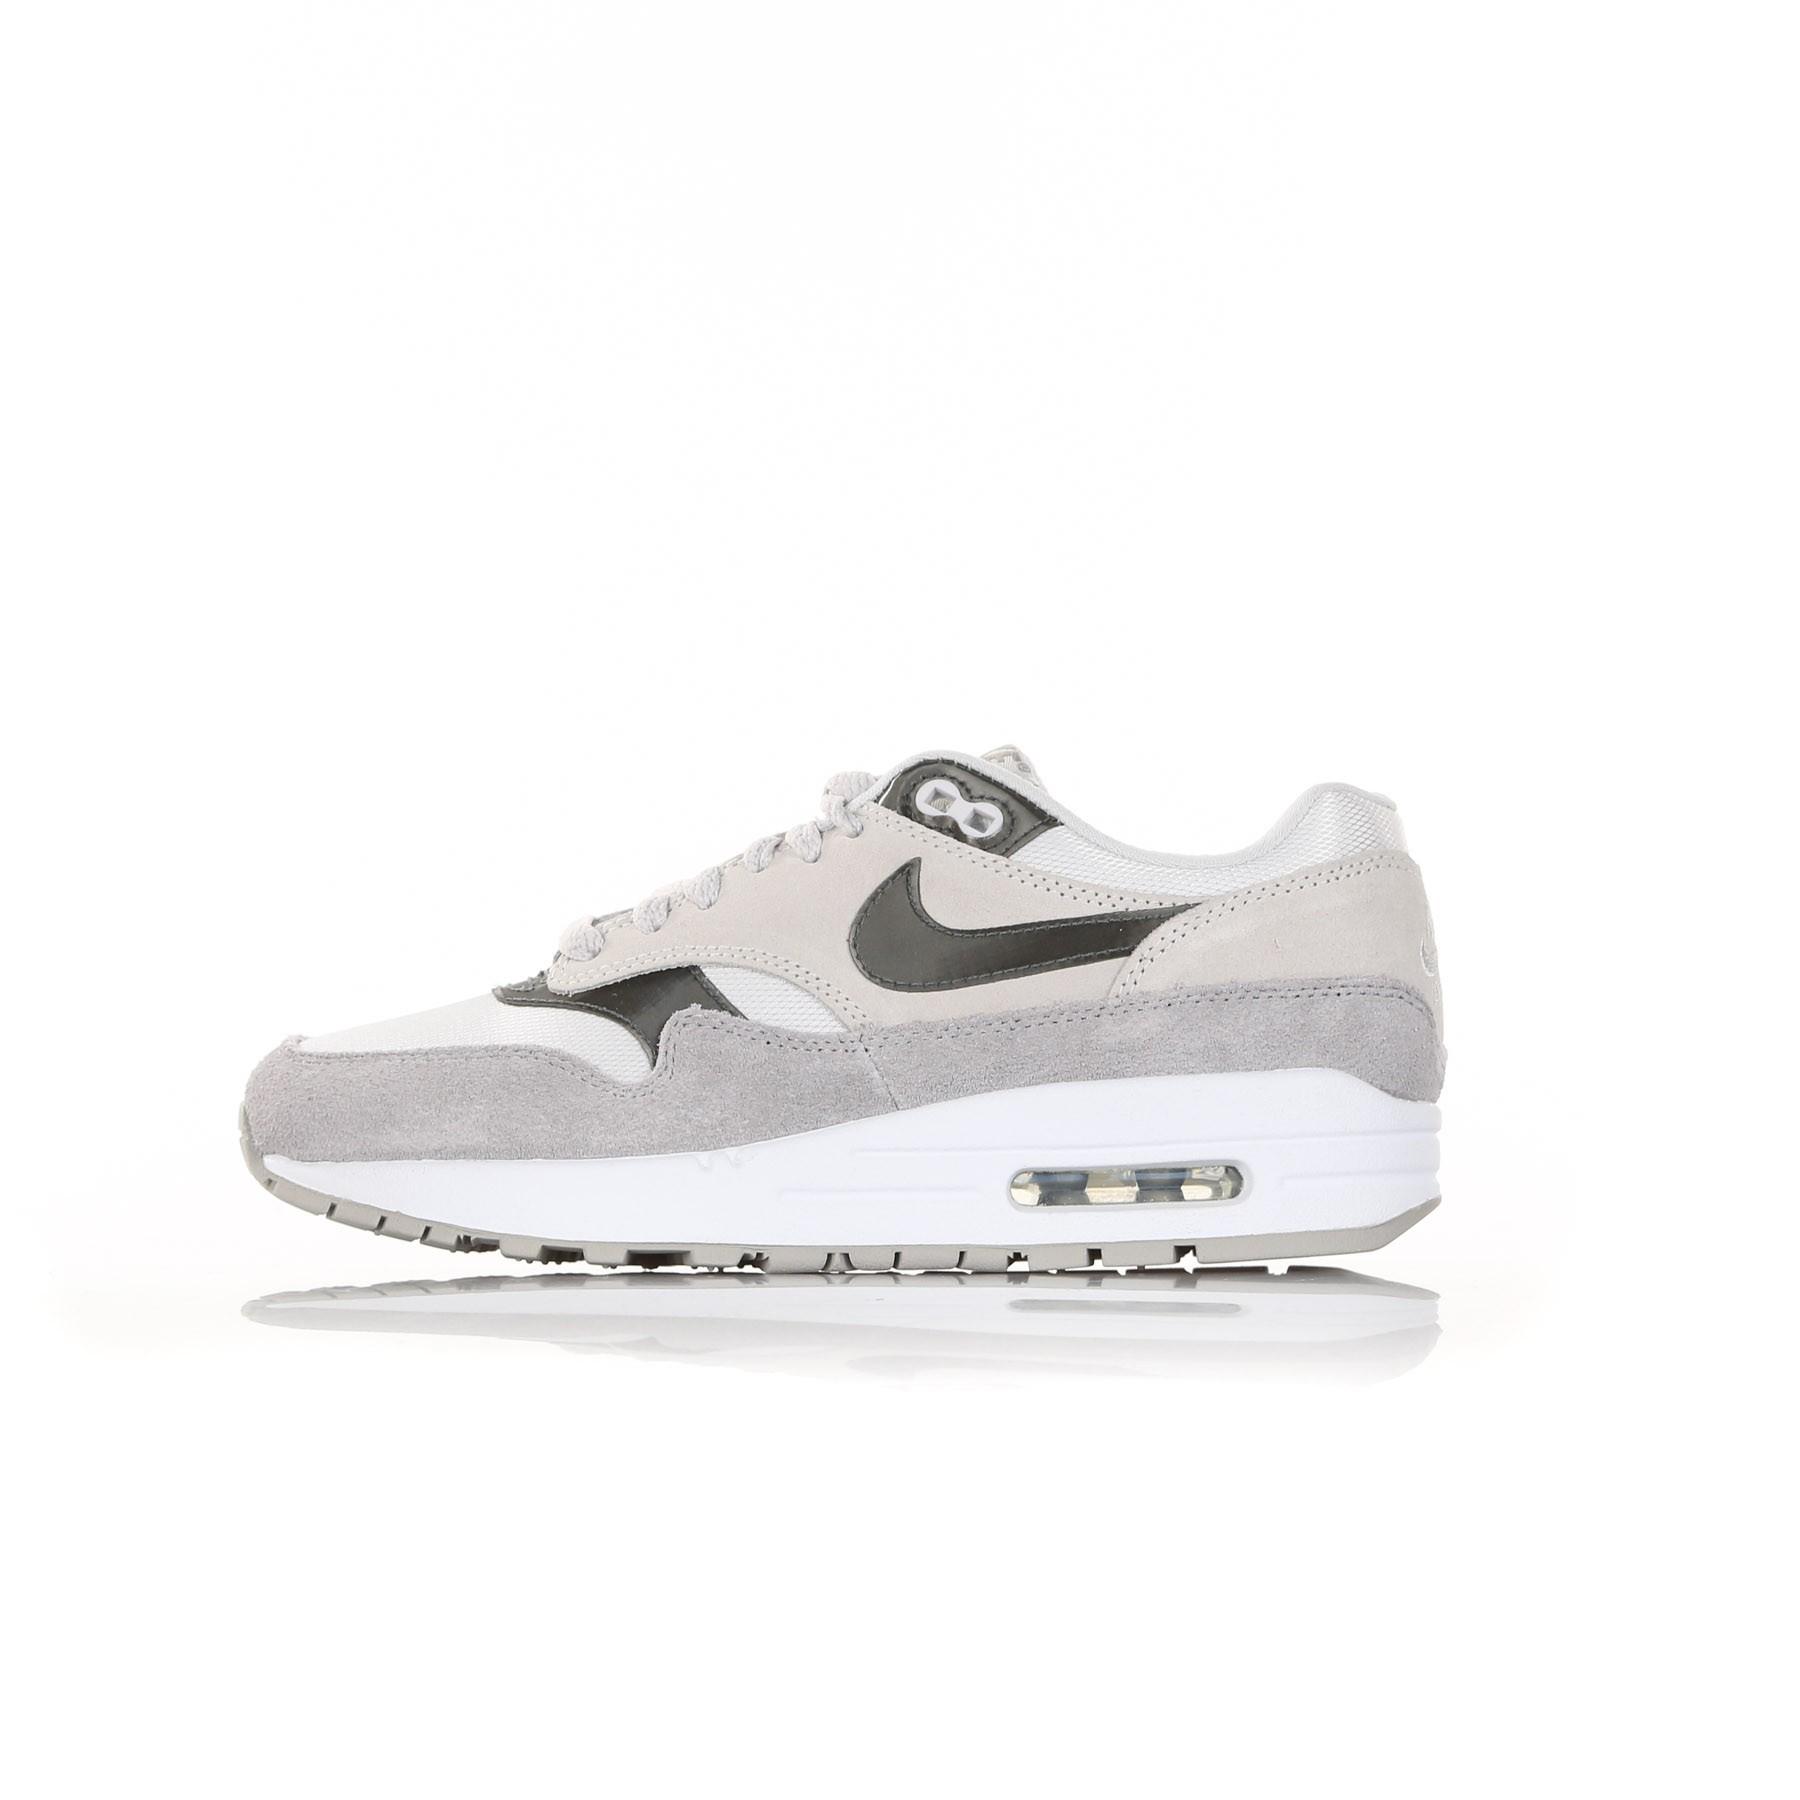 scarpa bassa donna w air max 1 se ATMOSPHERE GREY/THUNDER GREY/WHITE